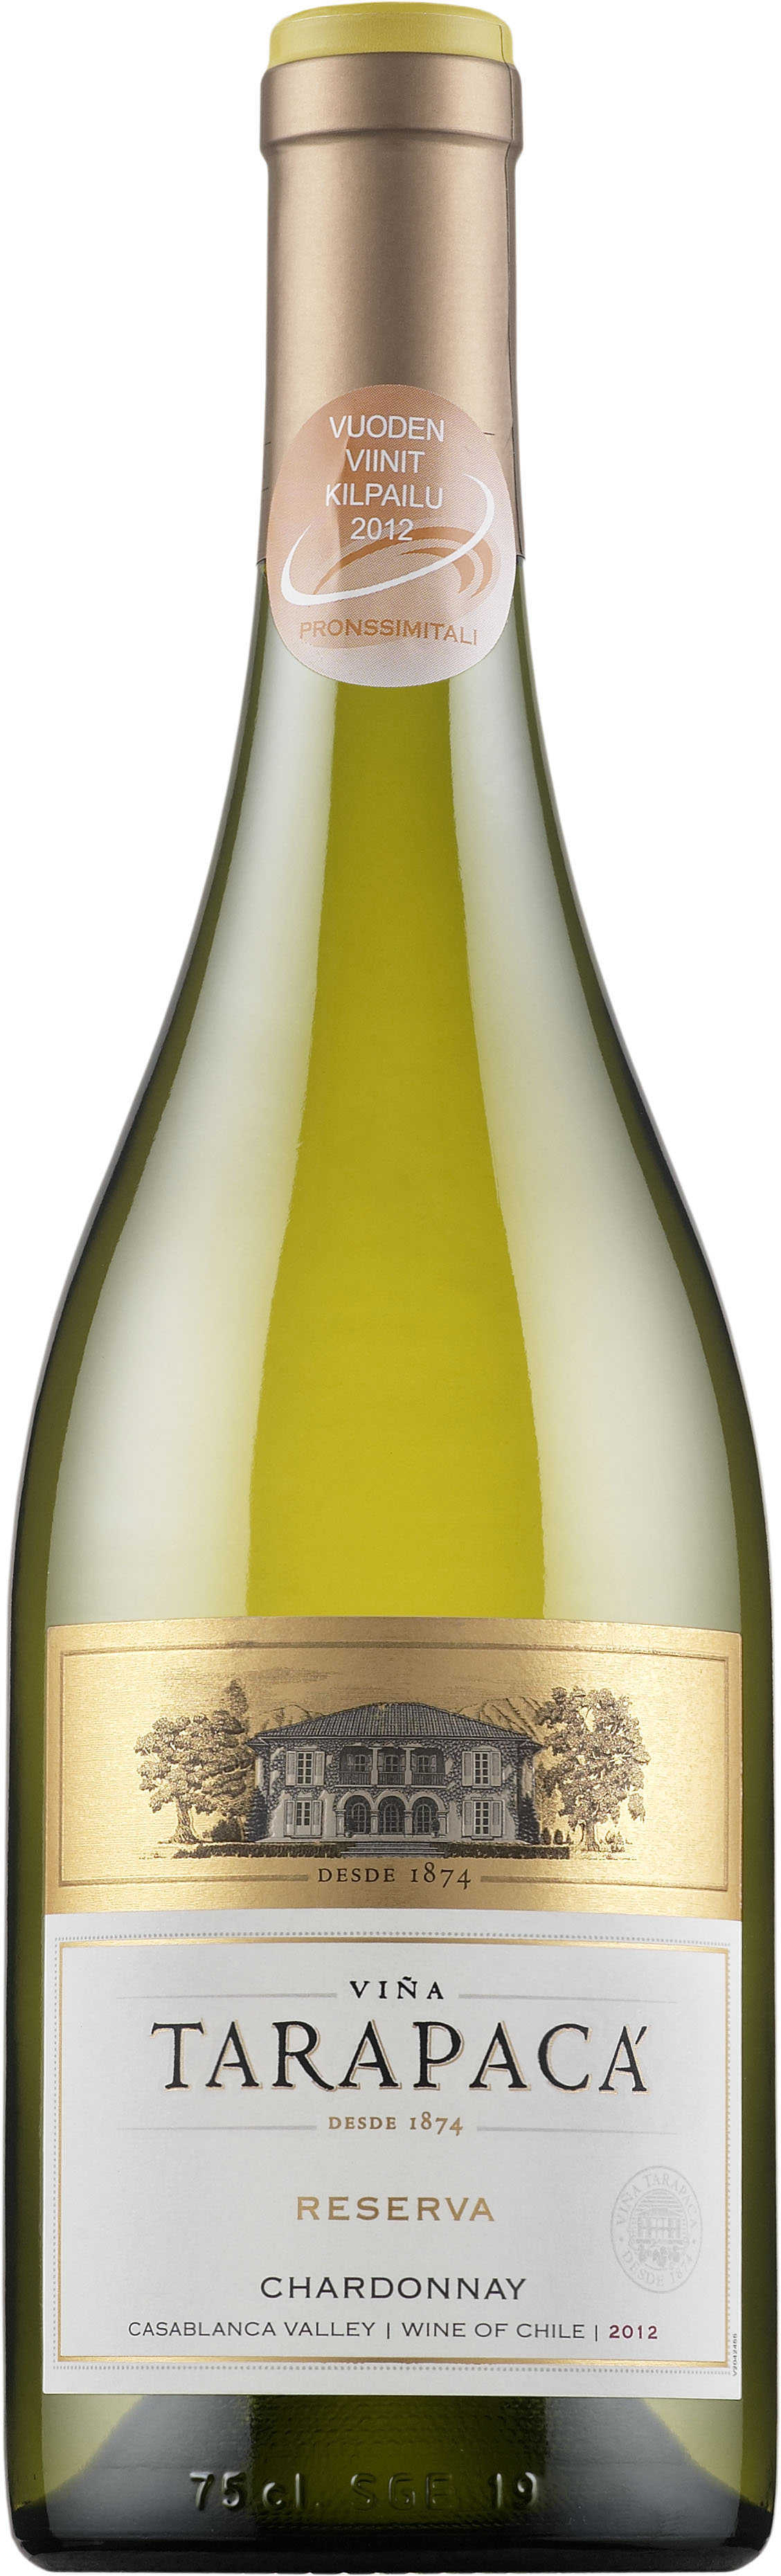 Tarapaca Reserva Chardonnay